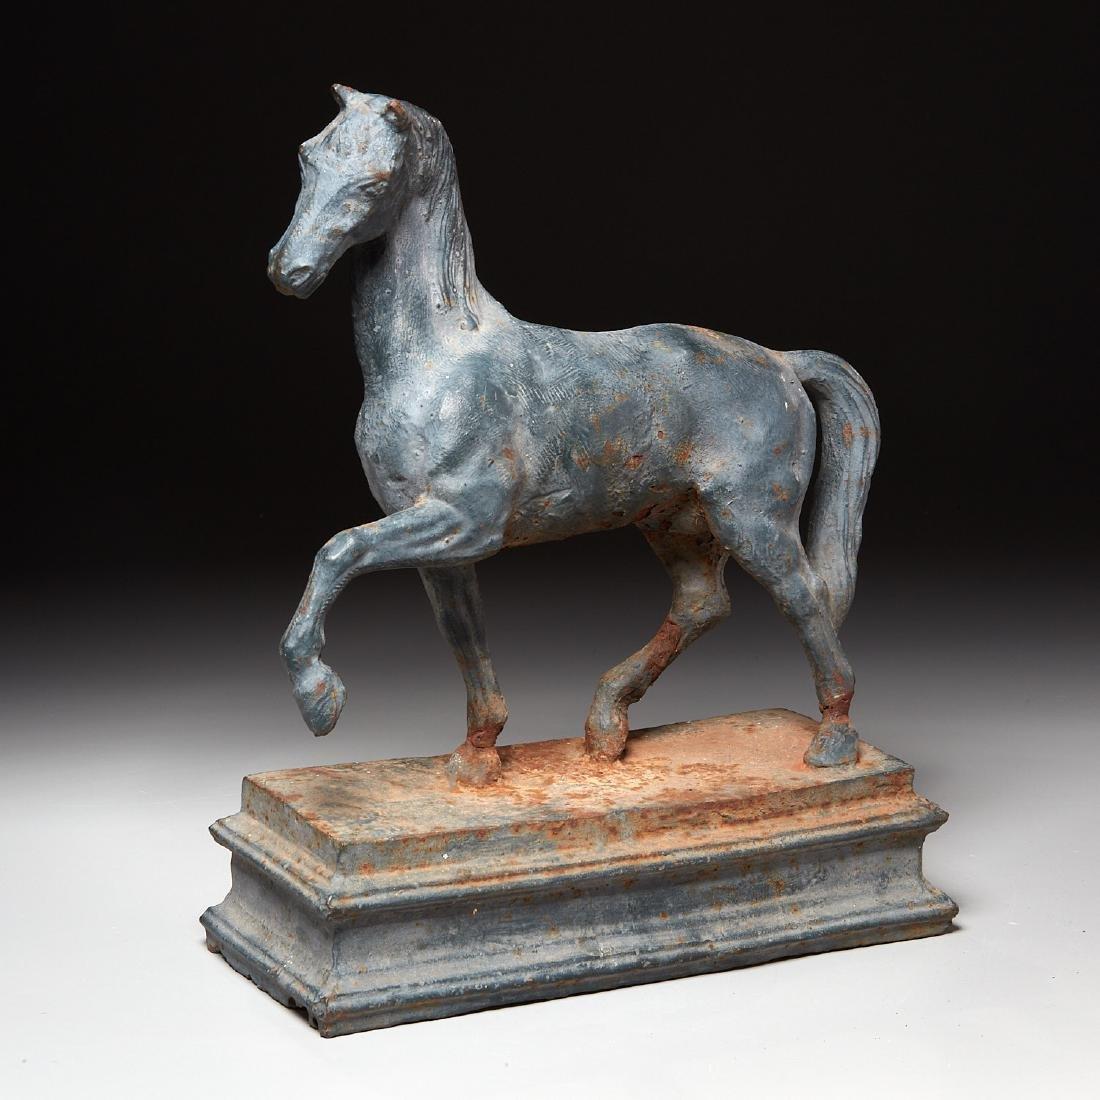 Cast iron horse figure on pedestal